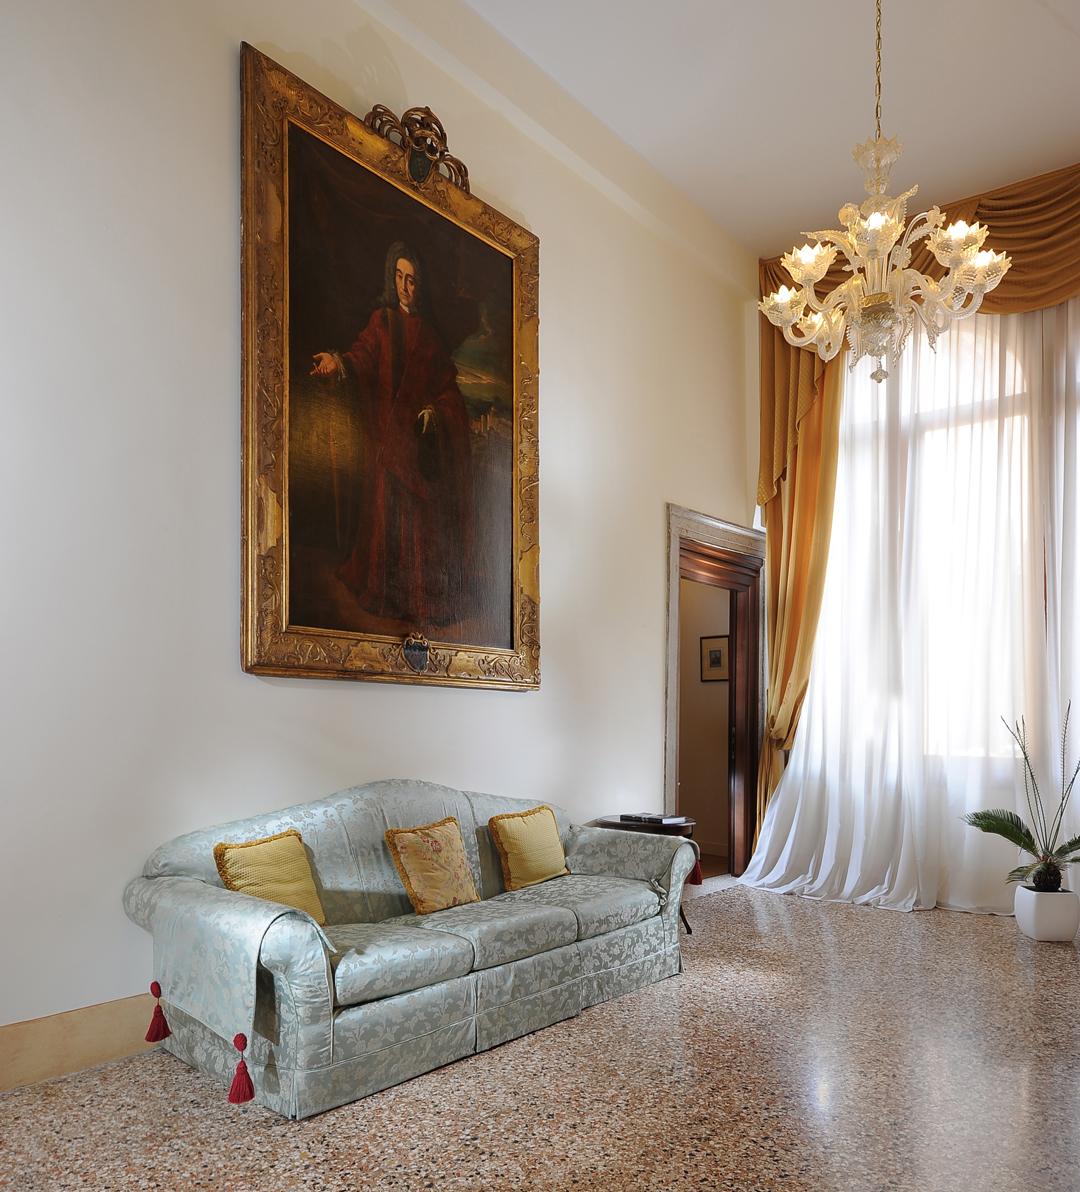 High ceilings Palazzo Vitturi | EAT.PRAY.MOVE Yoga | Venice, Italy